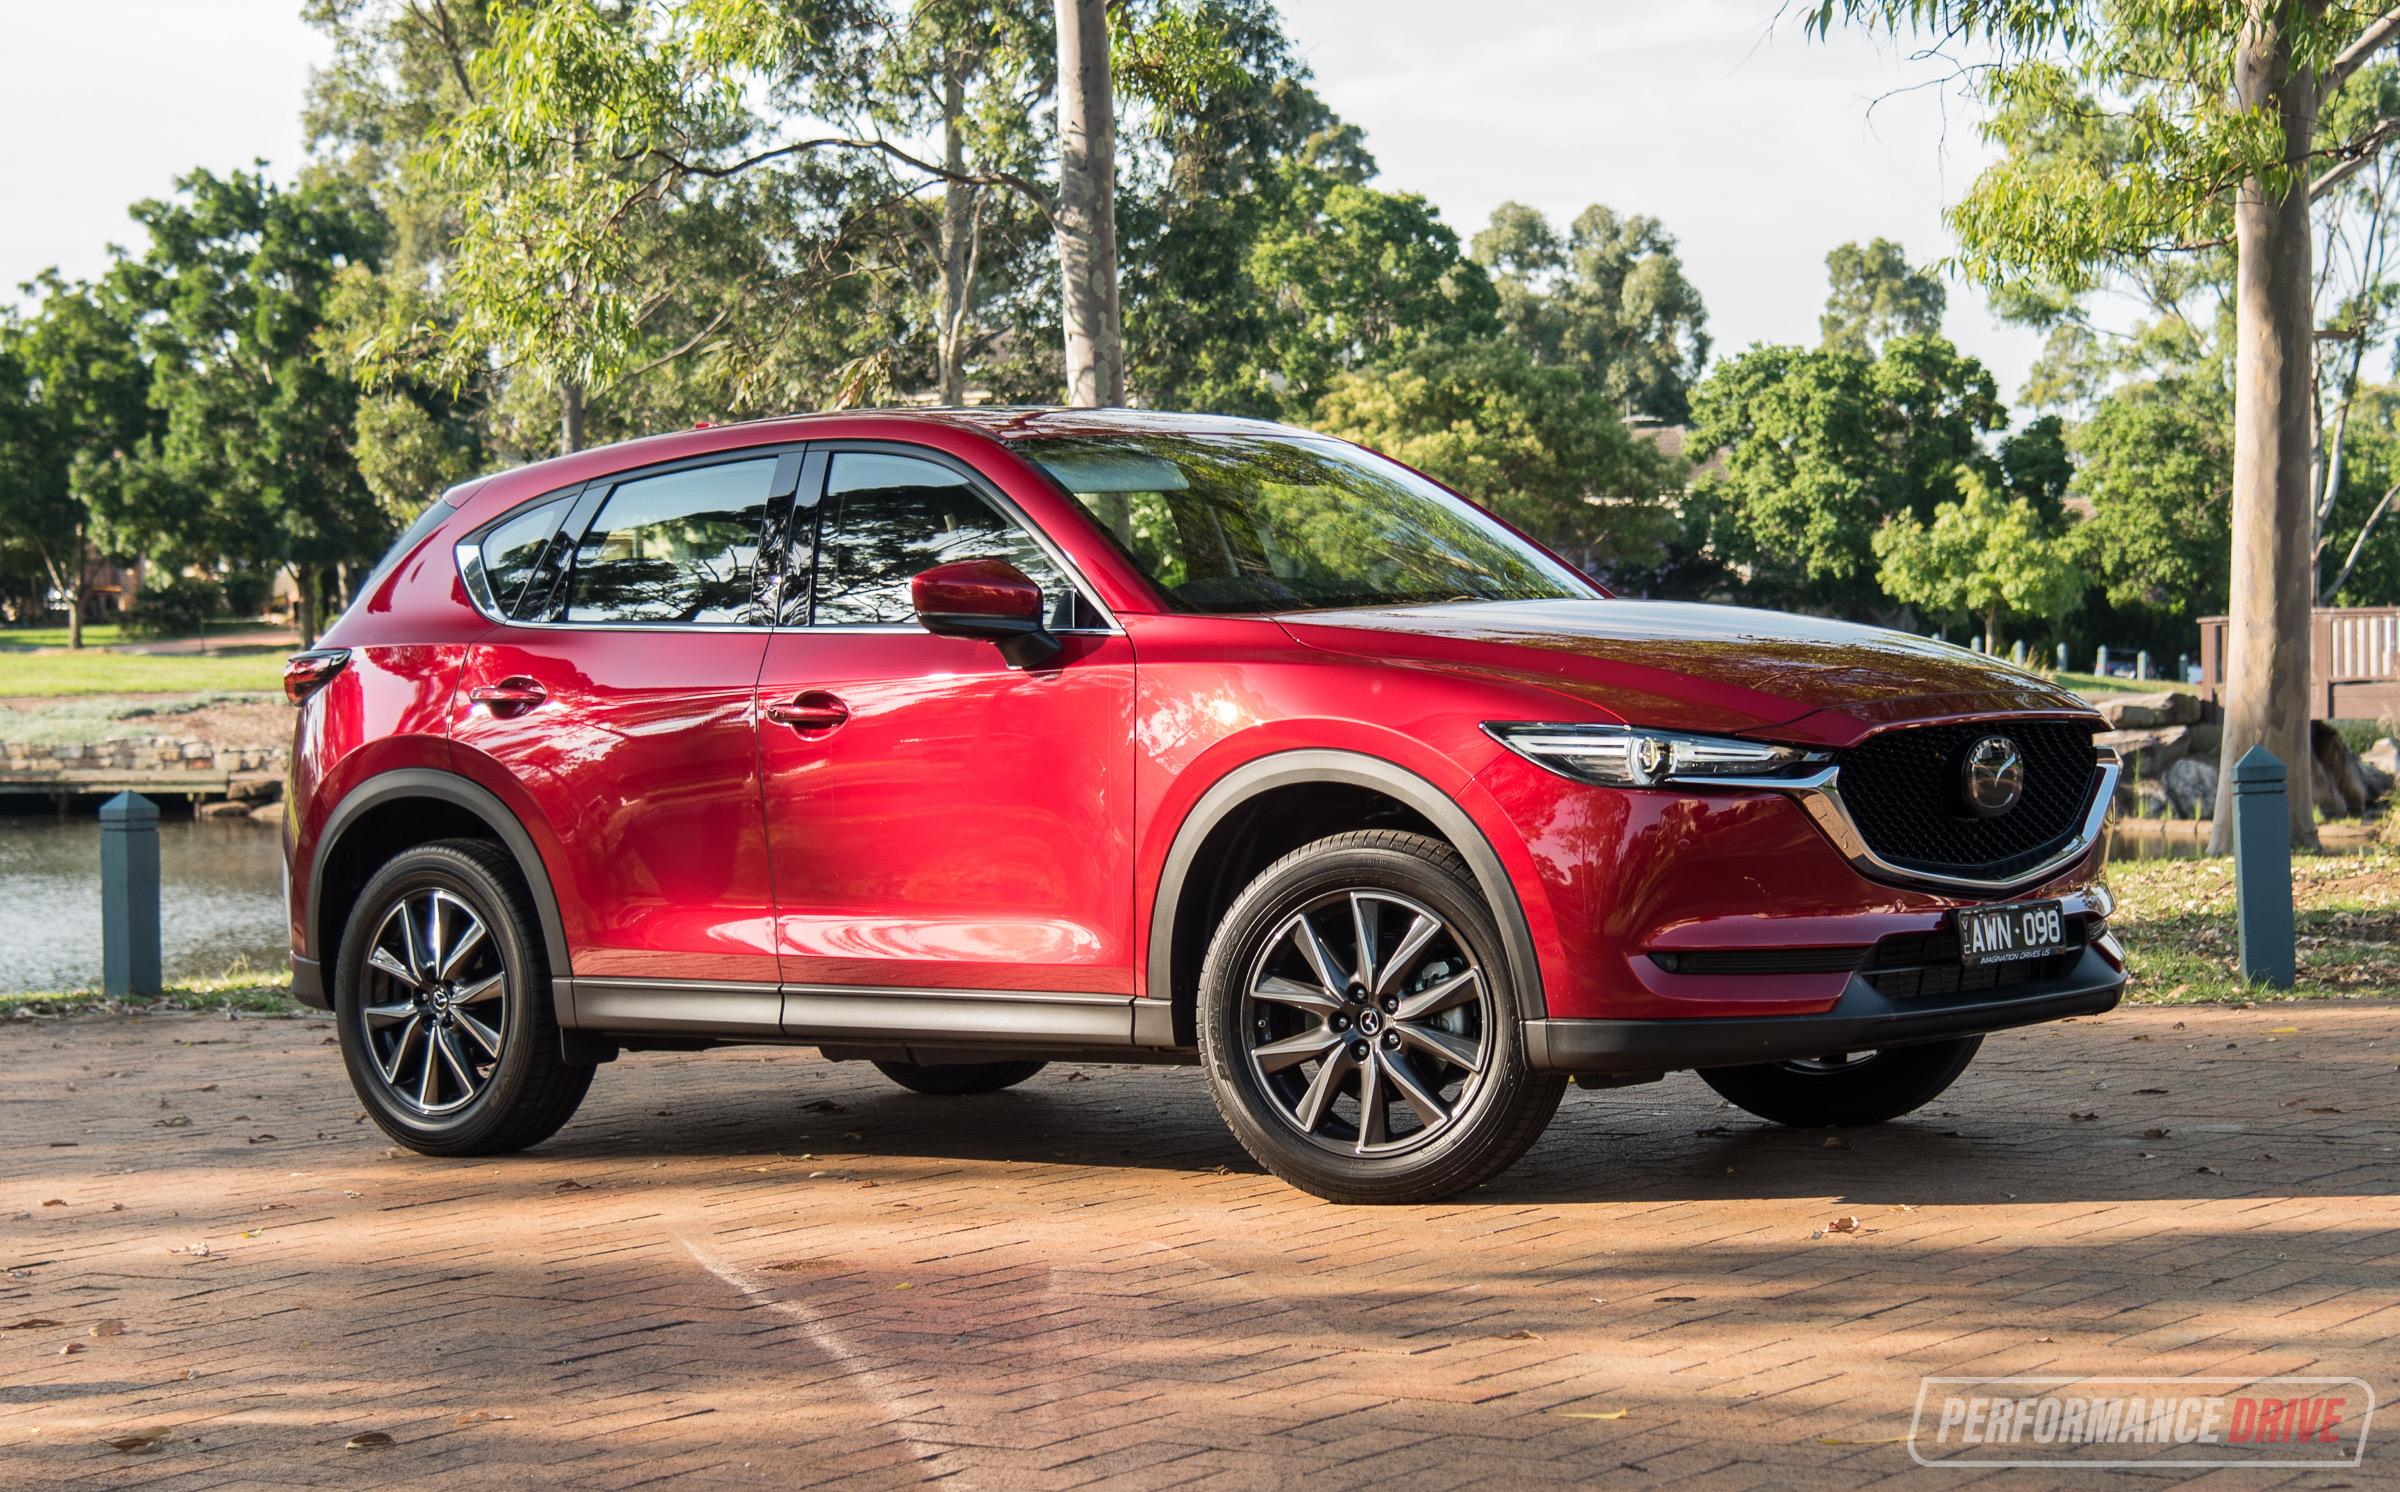 2019 Mazda CX-5 GT 2 5 turbo review (video) | PerformanceDrive